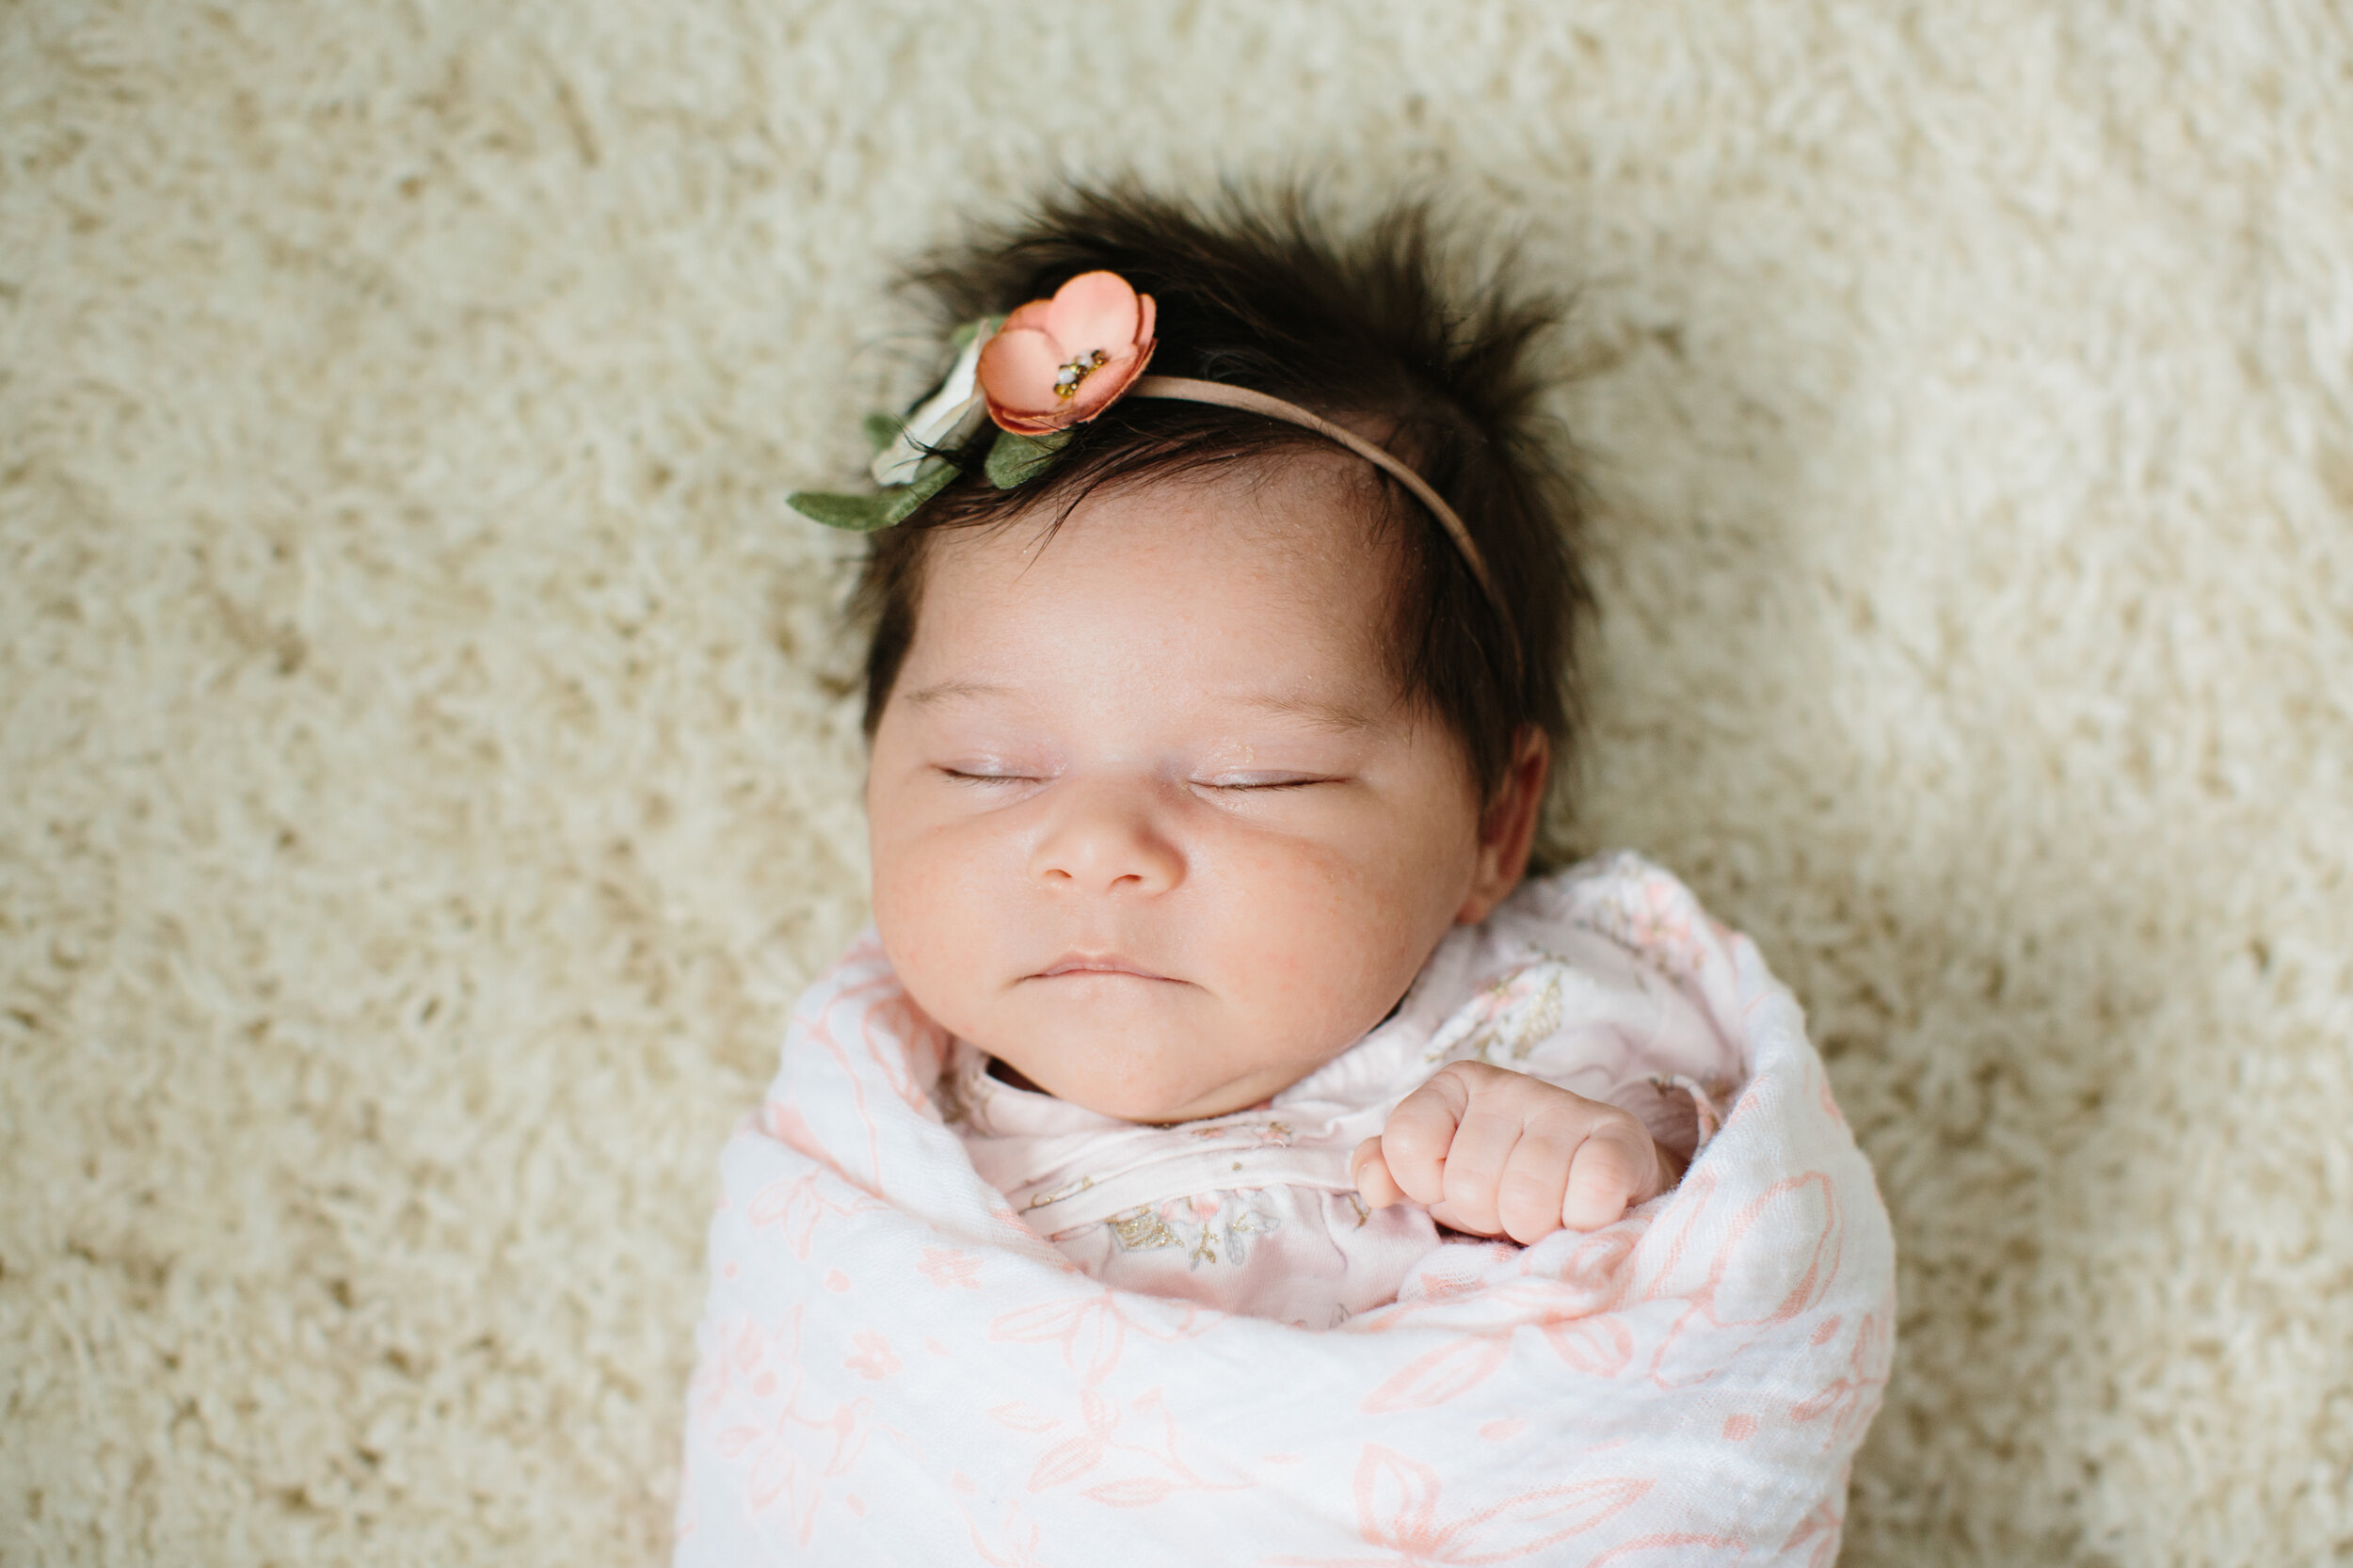 Evie_Newborn_Abigail_Malone_Photography-9.jpg